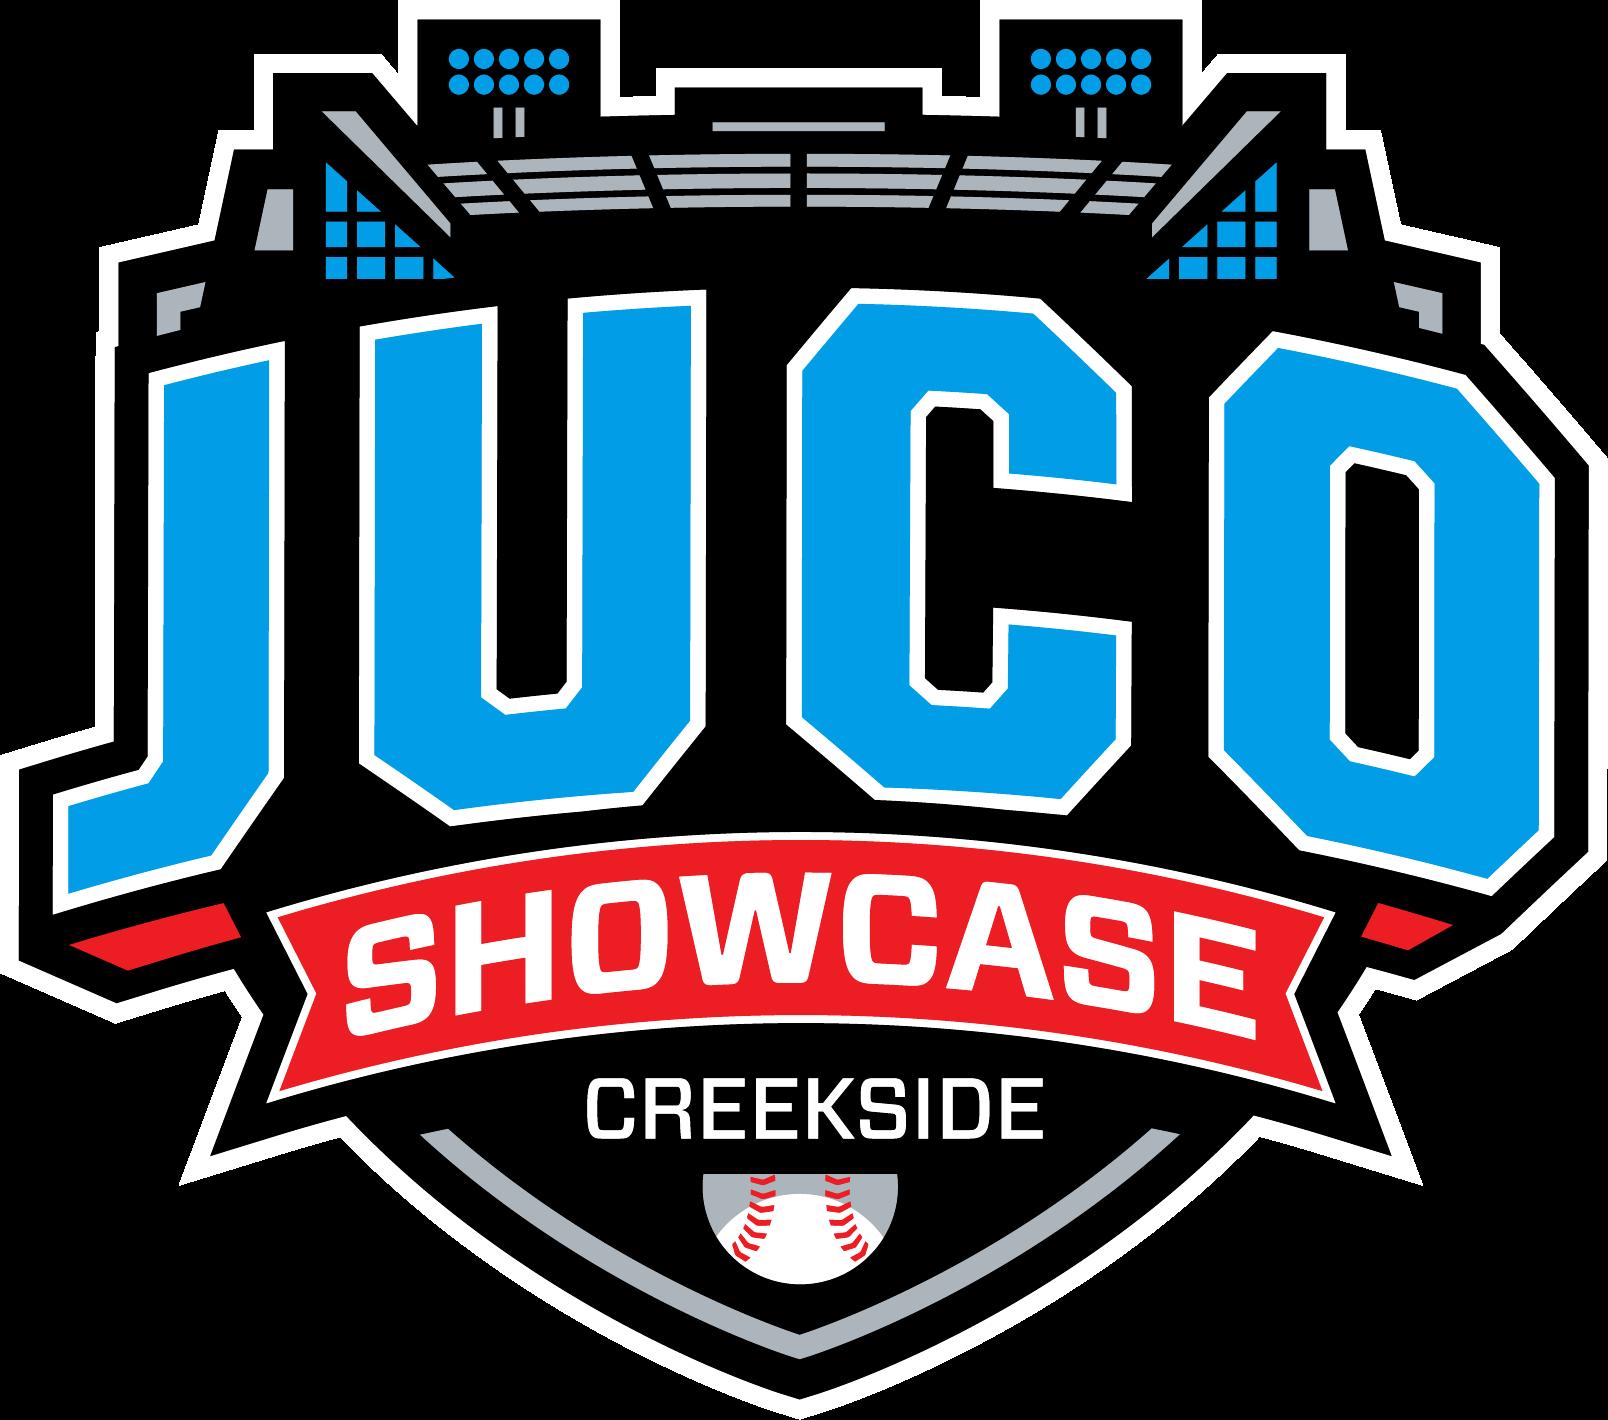 Creekside JUCO Showcase